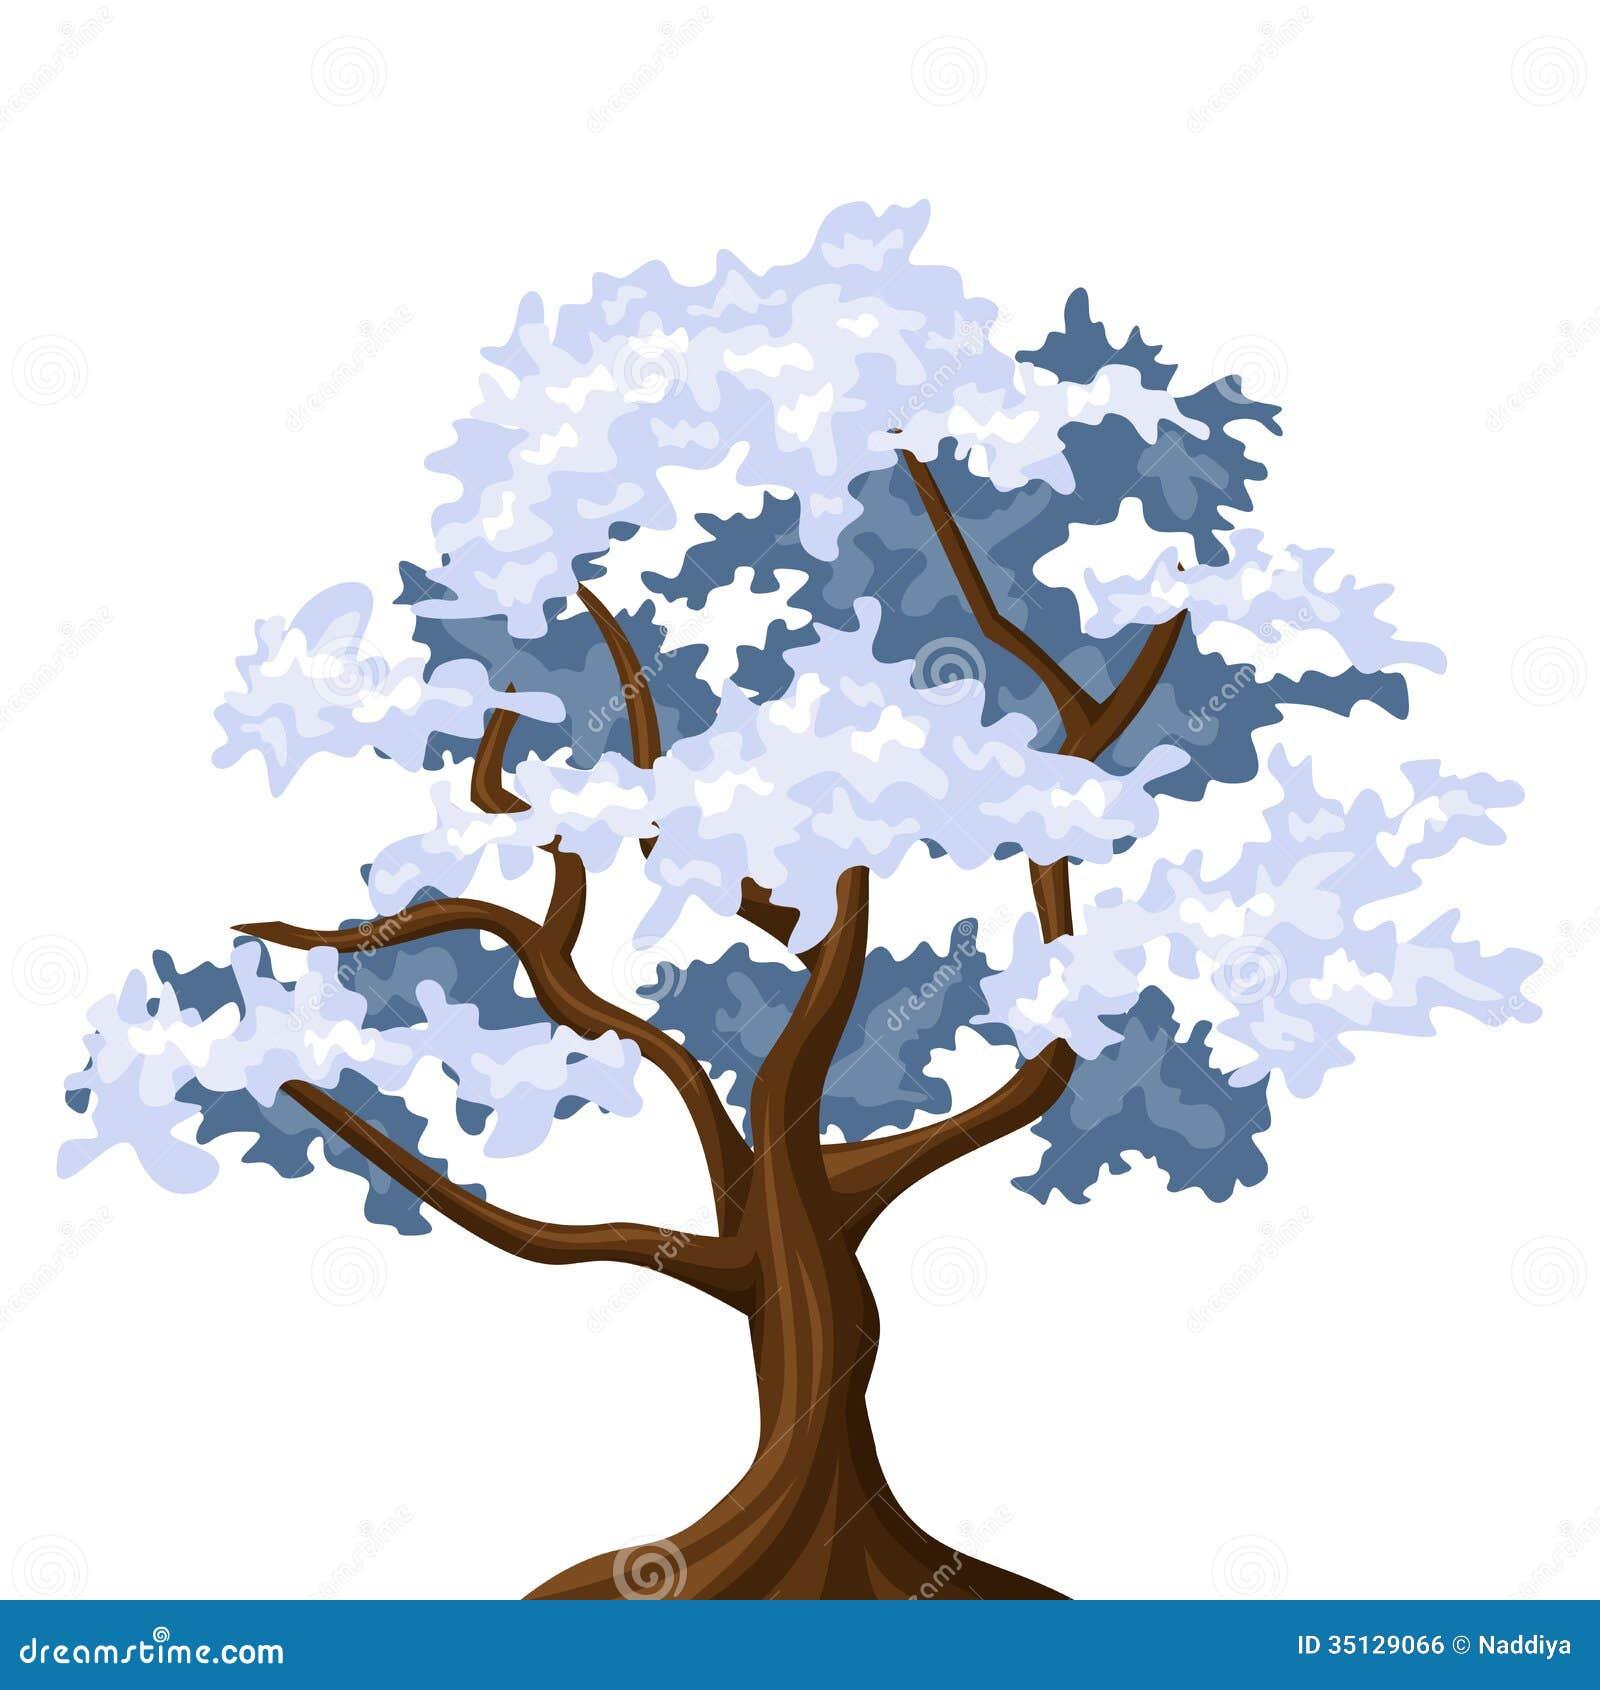 Green Free Pine Tree Clipart School - Snow On Tree Clipart - Free  Transparent PNG Clipart Images Download